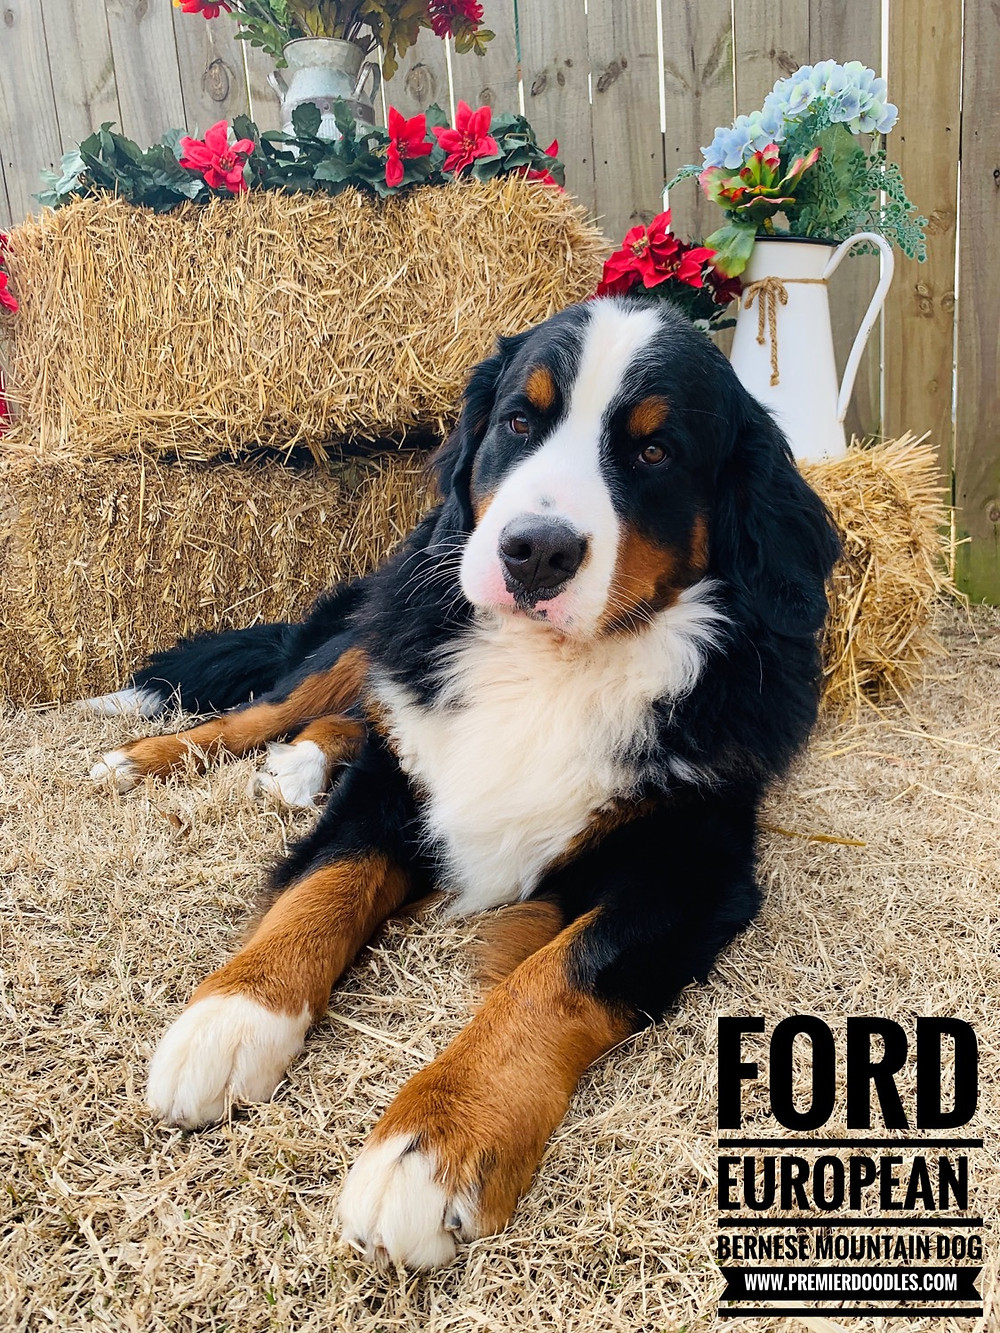 Ford (European Bernese Mountain Dog)